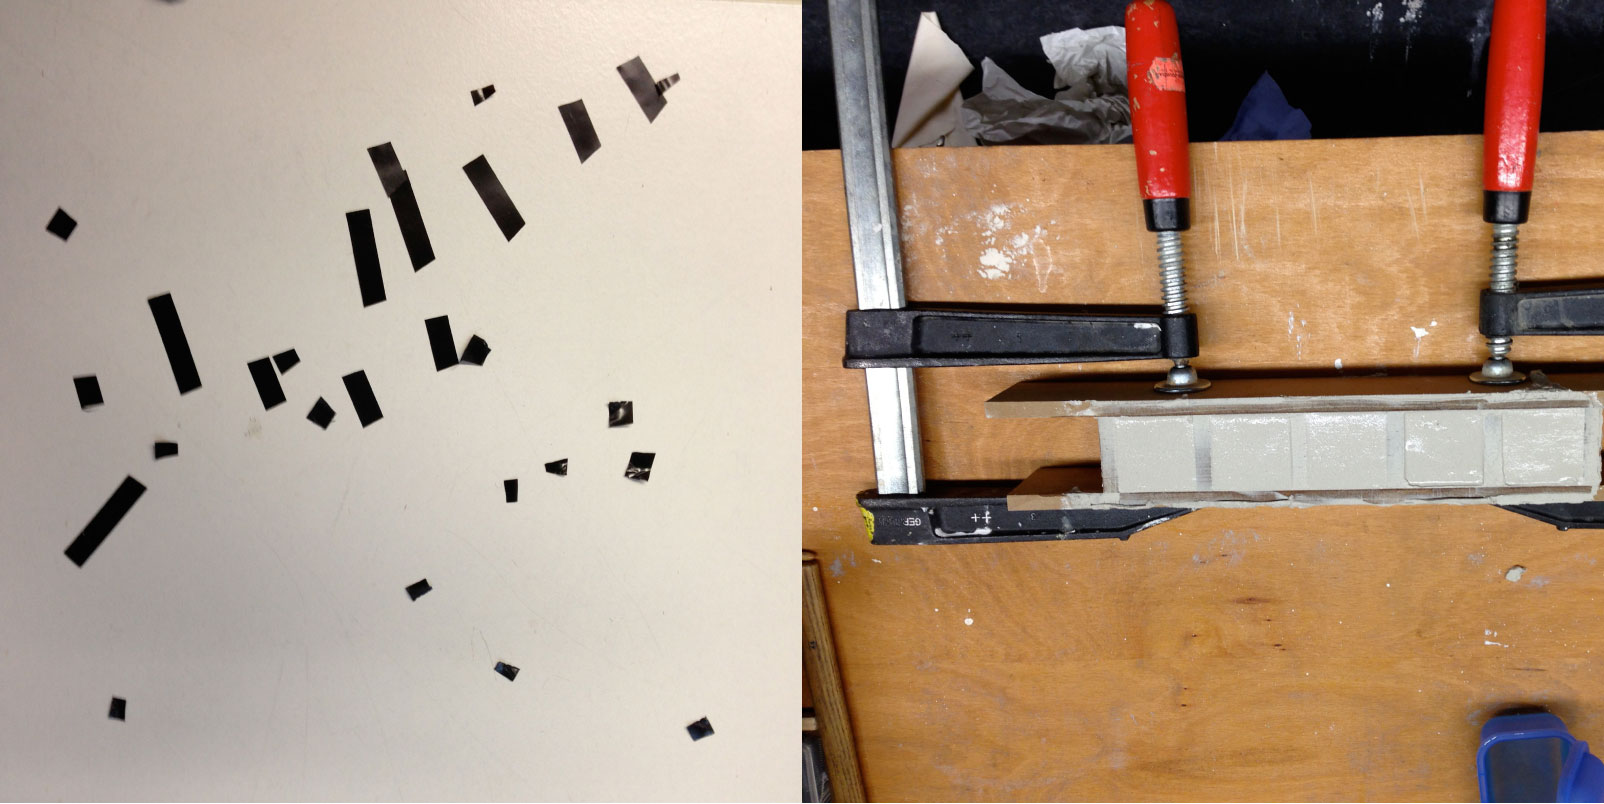 gerrit_schweiger-Nice_to_have-Must_have-unreachable-Accessoire-Accessory-Designprozess-Design_Thinking-Social_Design-Ausstellung-CAD-Raum-Illustration-Skulptur-Plakat-Typographie-Marke-Inspiration-31